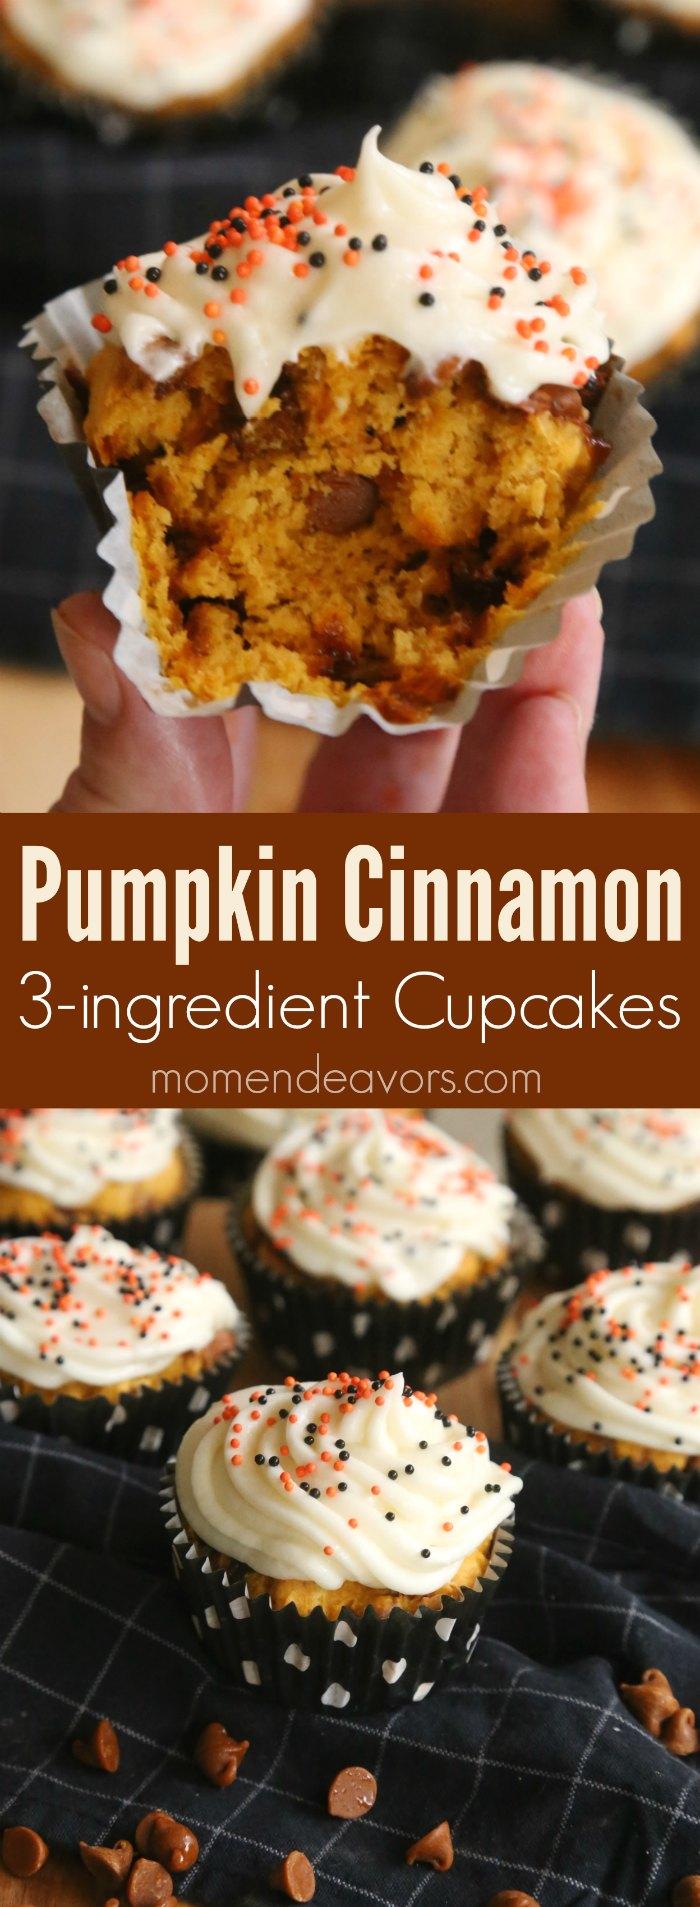 pumpkin-cinnamon-cupcakes-recipe